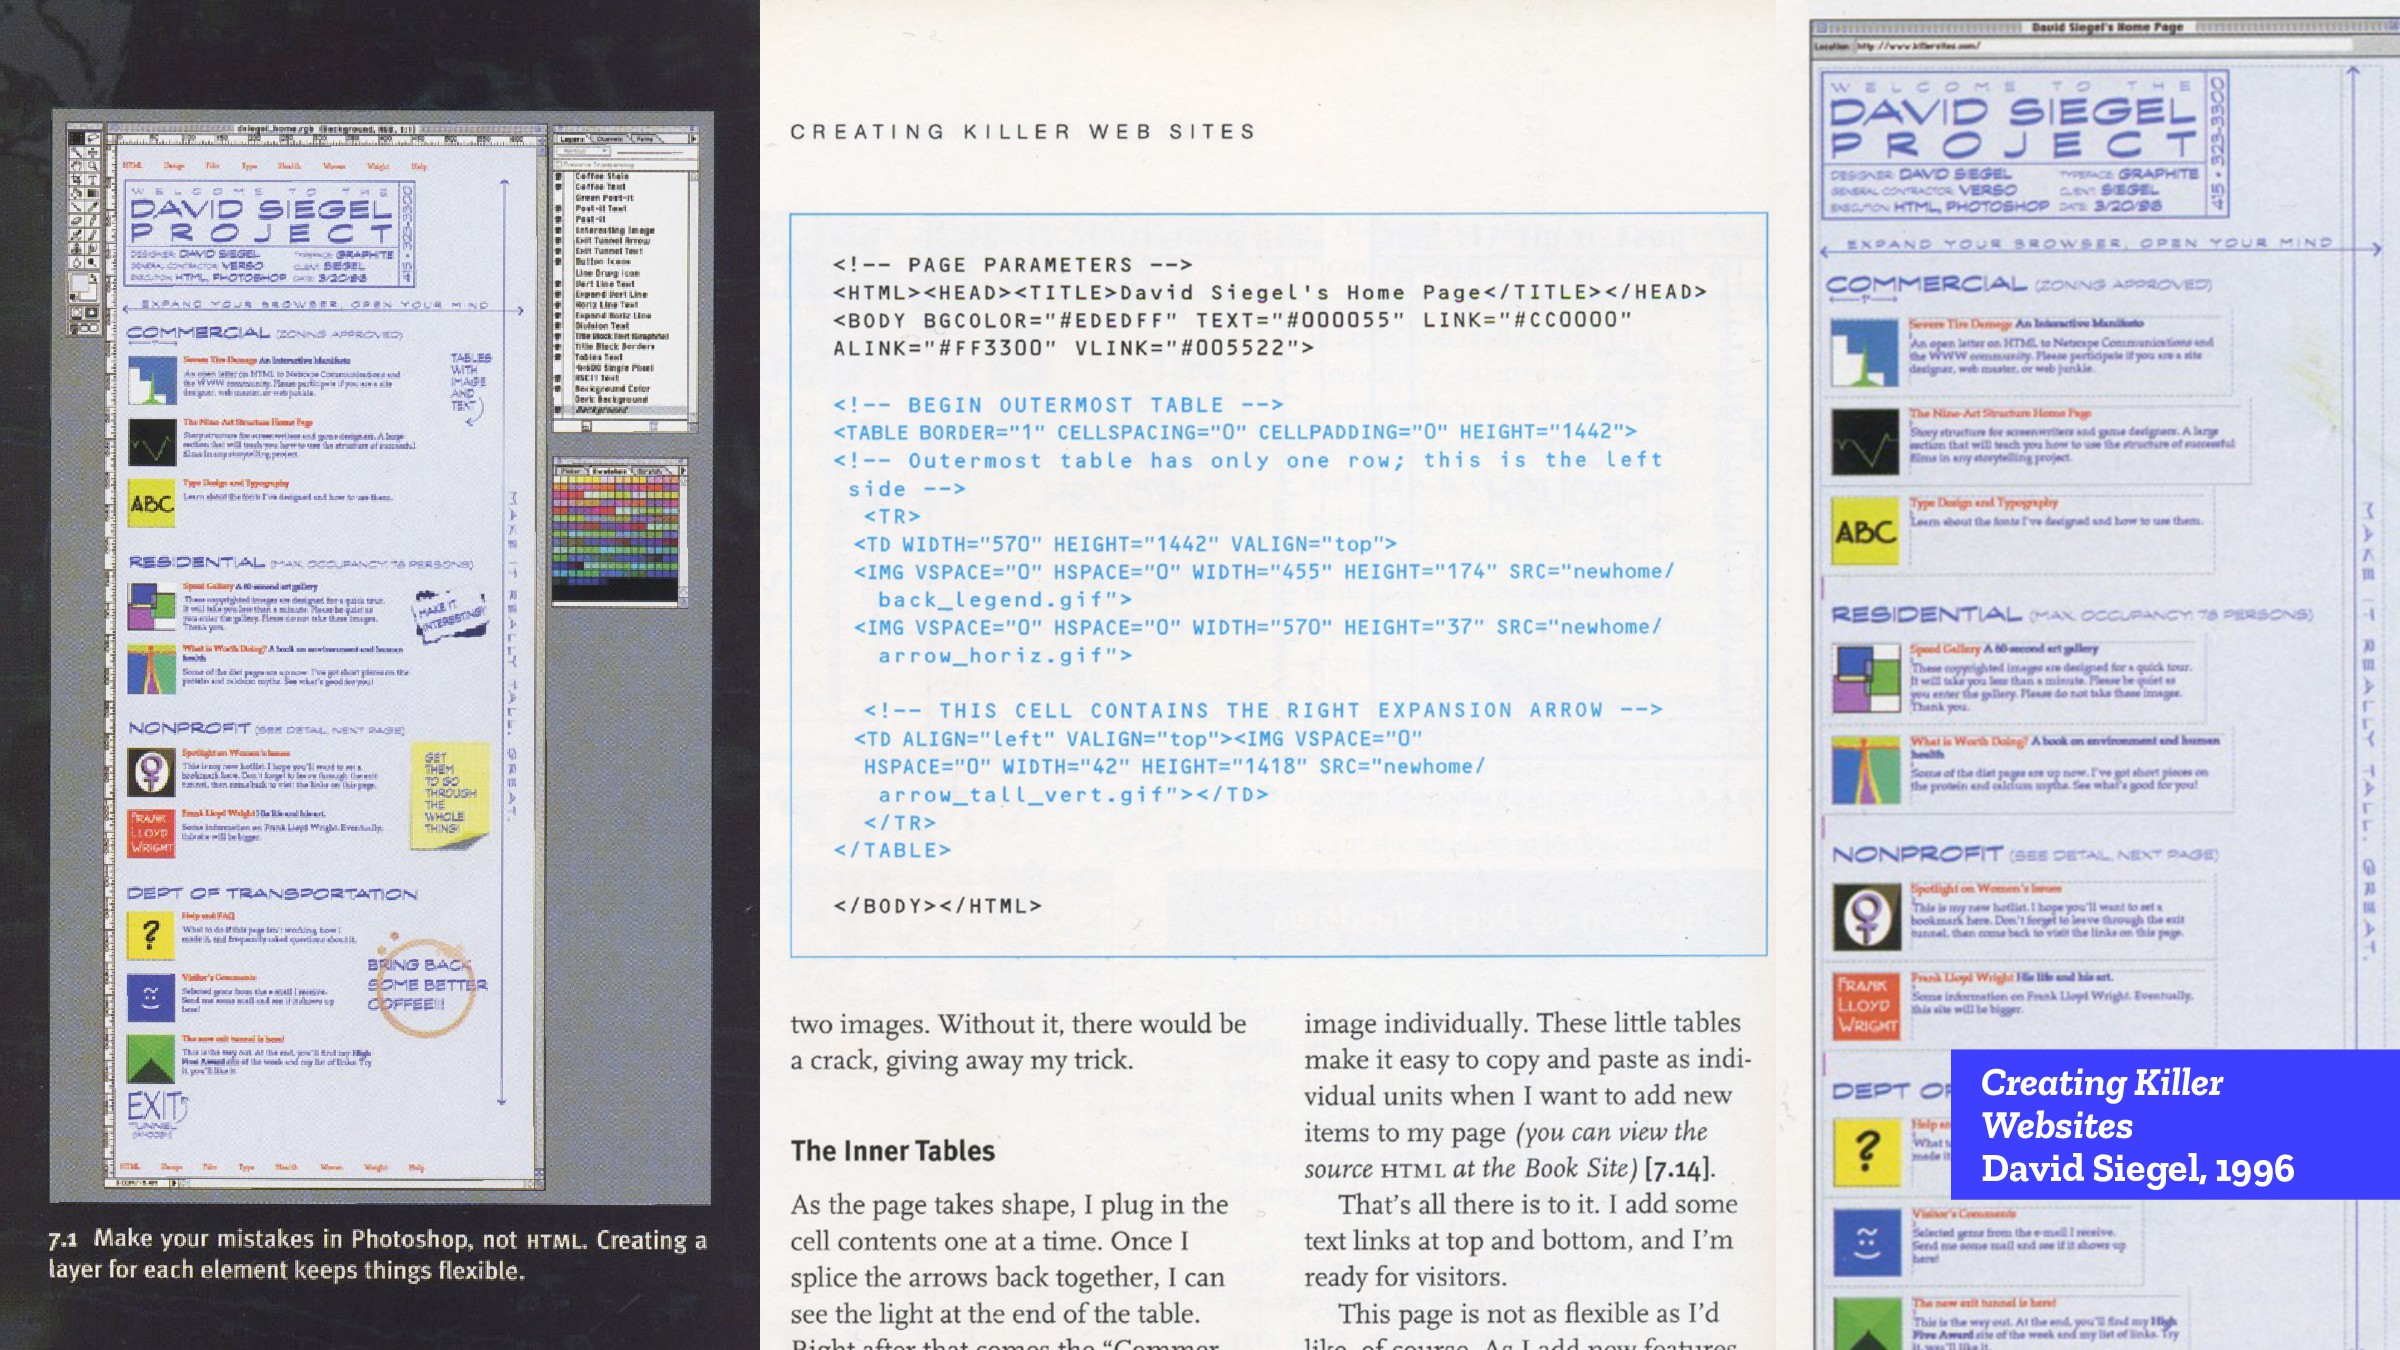 Creating Killer Websites David Siegel, 1996